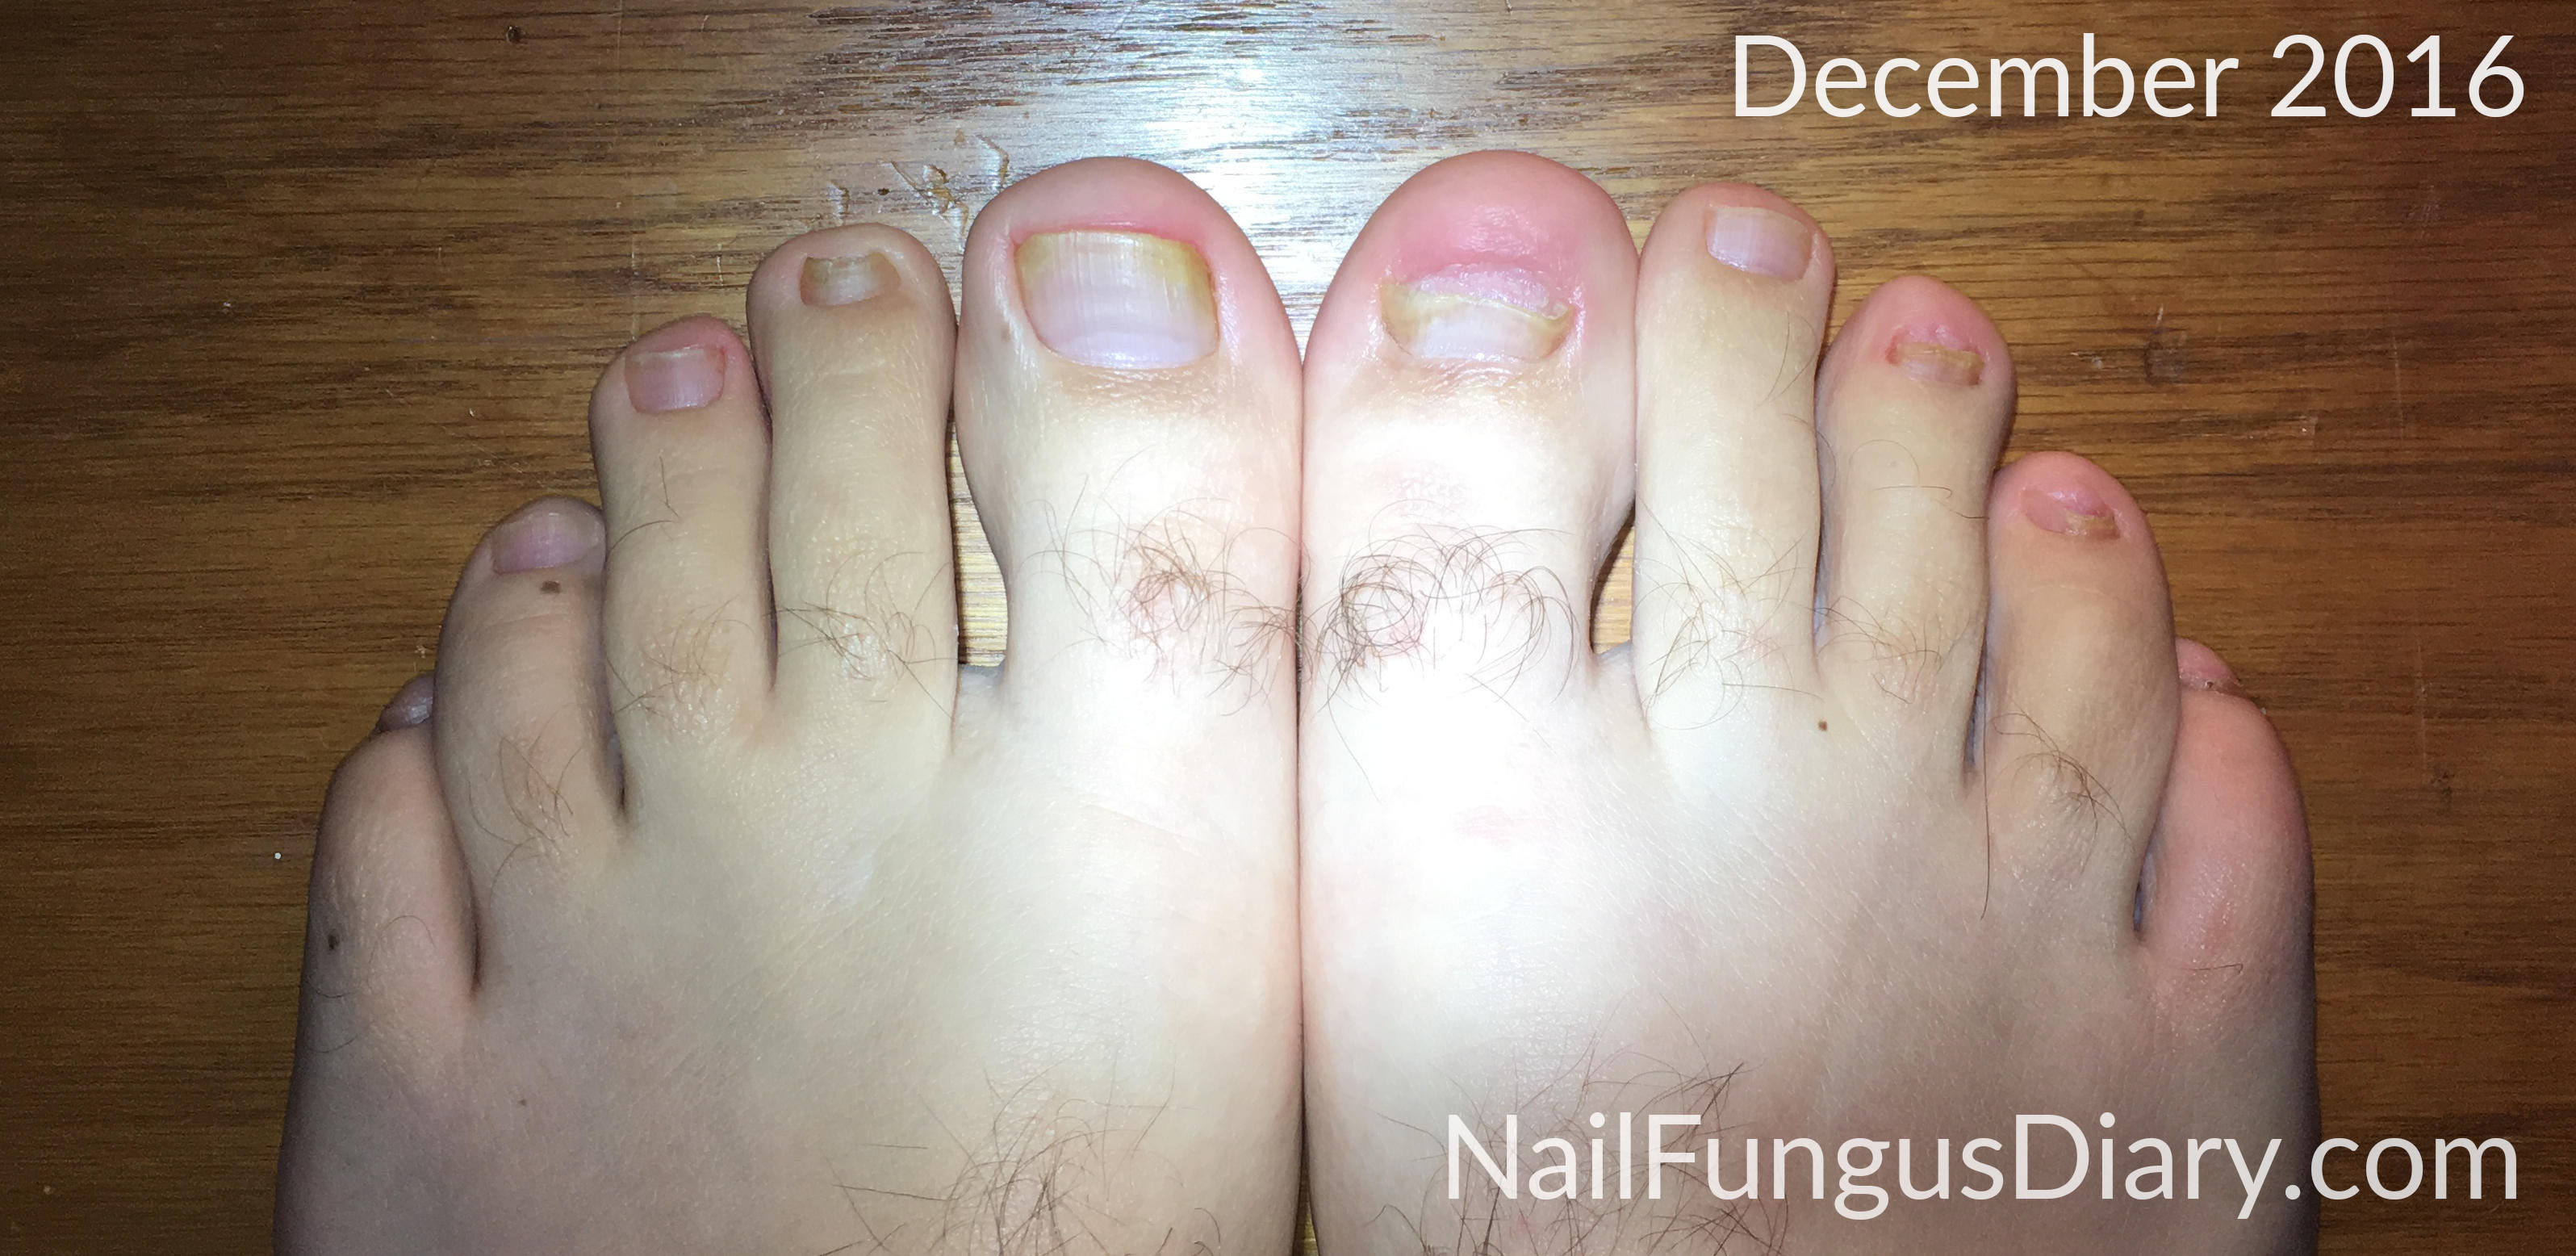 Nail Fungus Update, December 2016 - Nail Fungus Diary